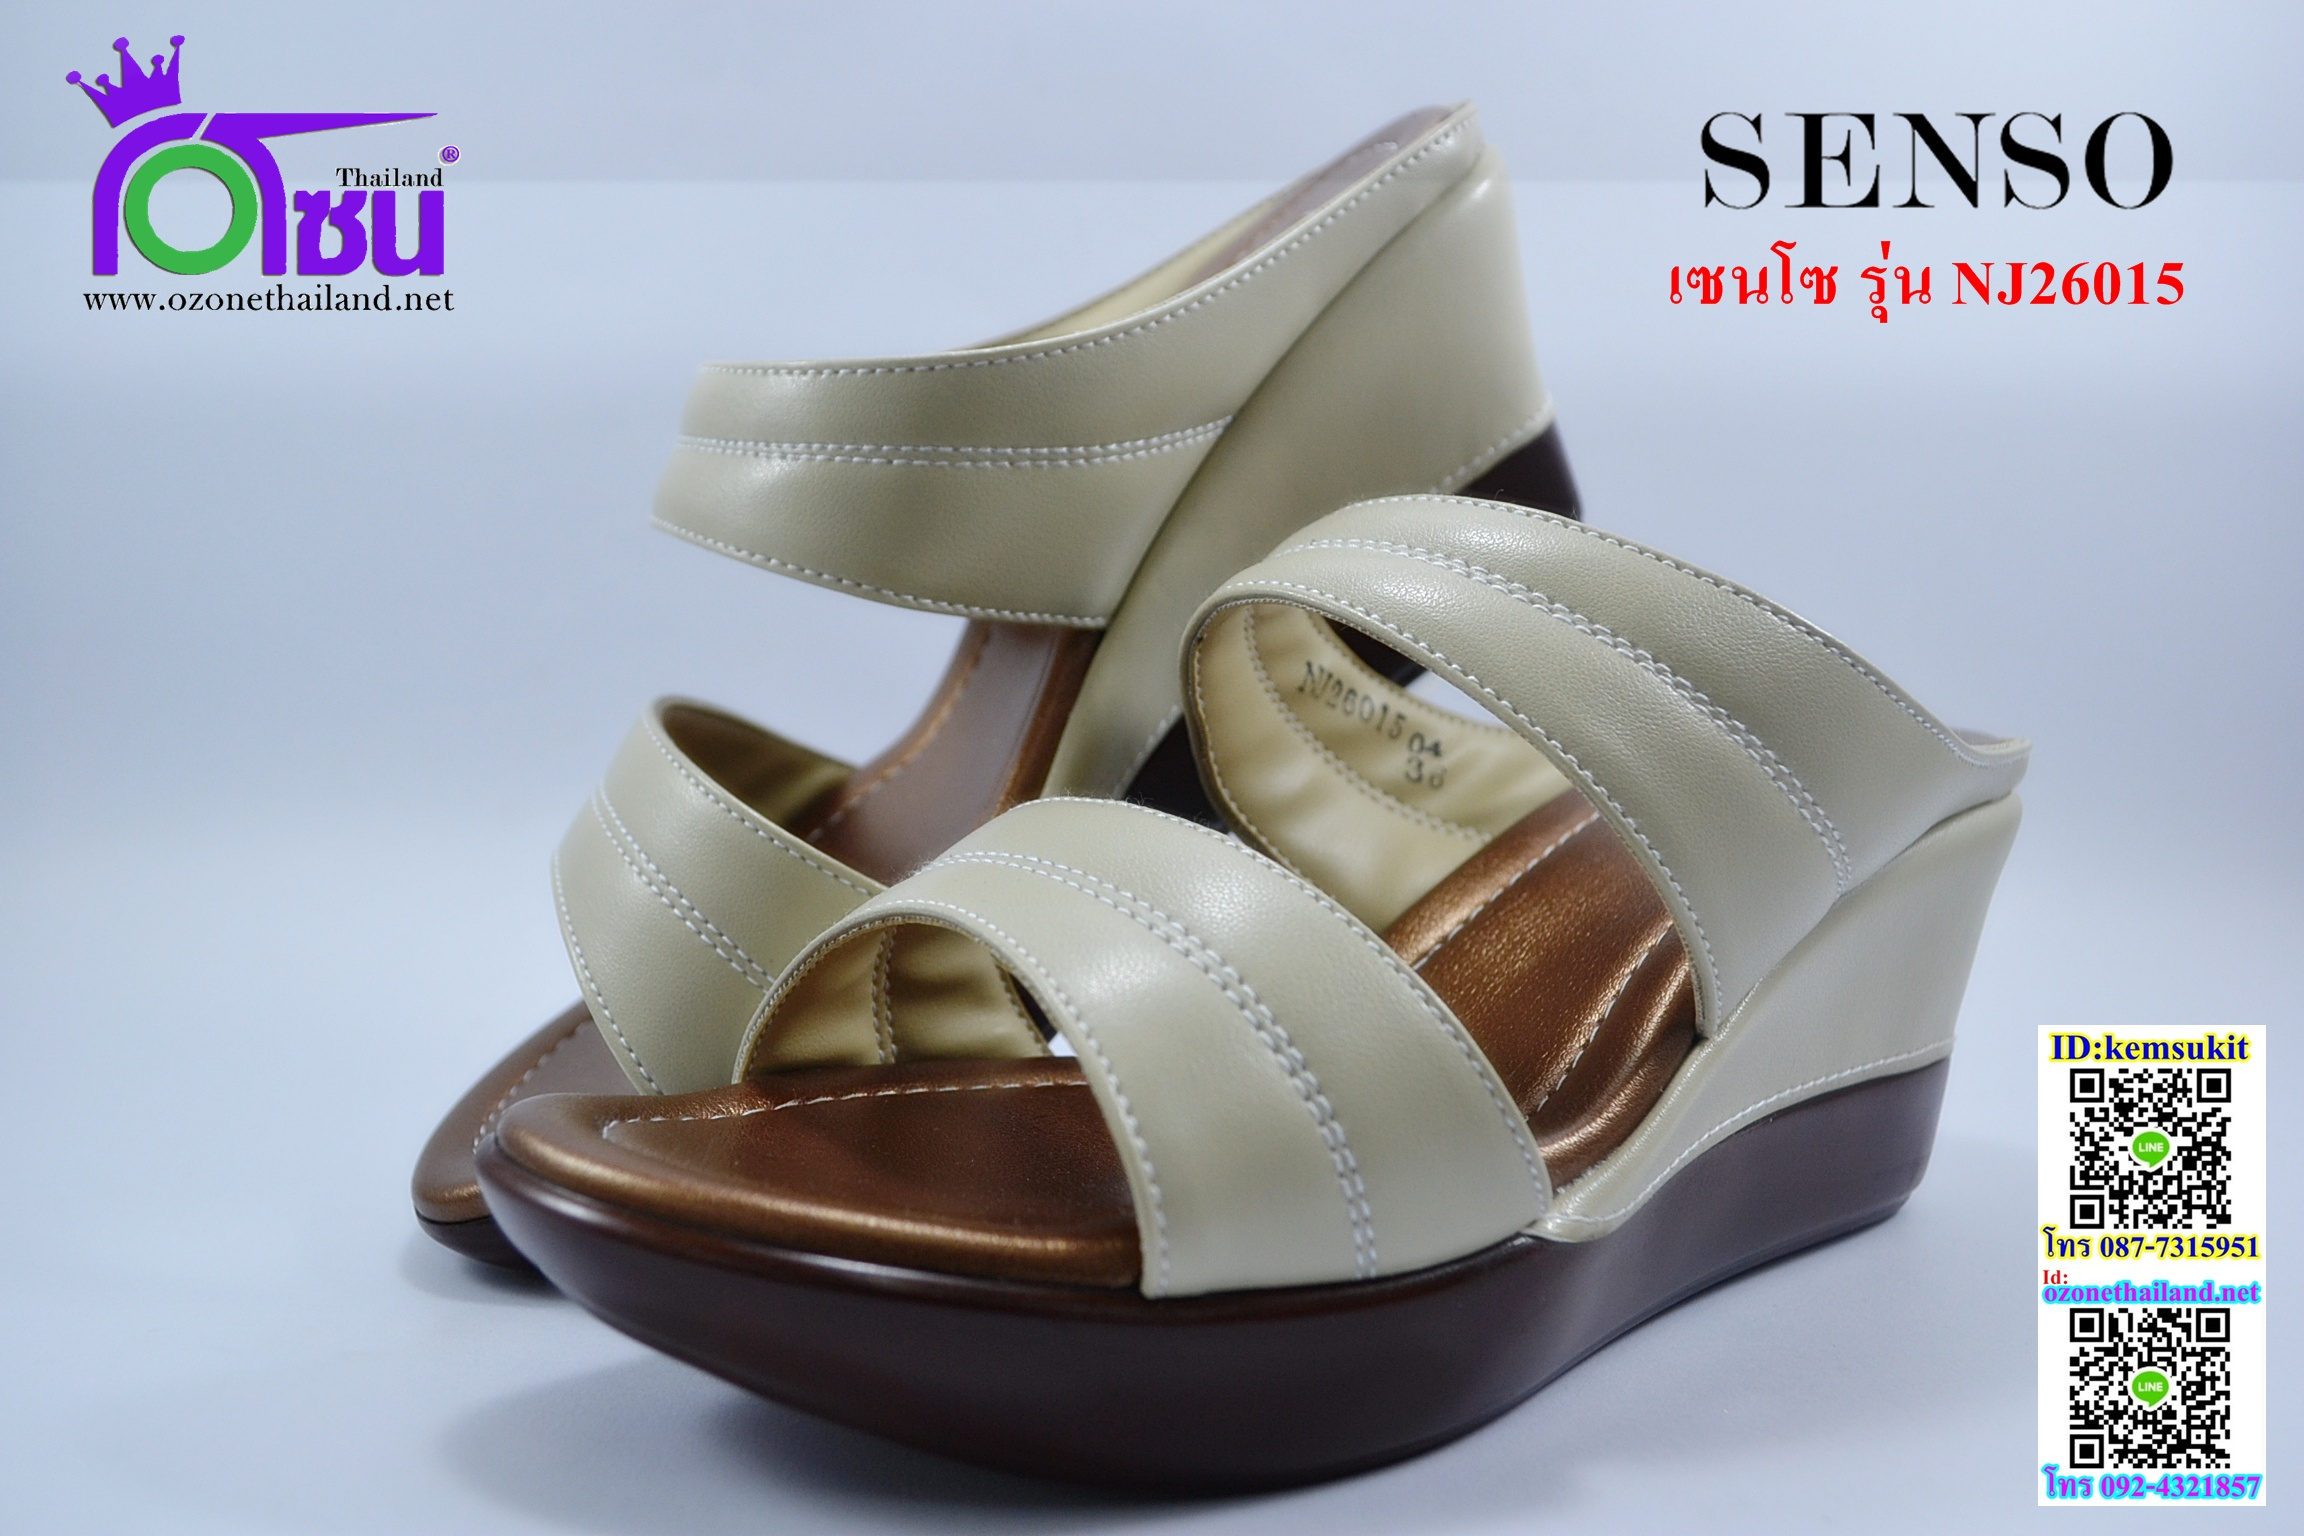 senso (เซนโซ) สีครีม รุ่นNJ26015-04 เบอร์36-40